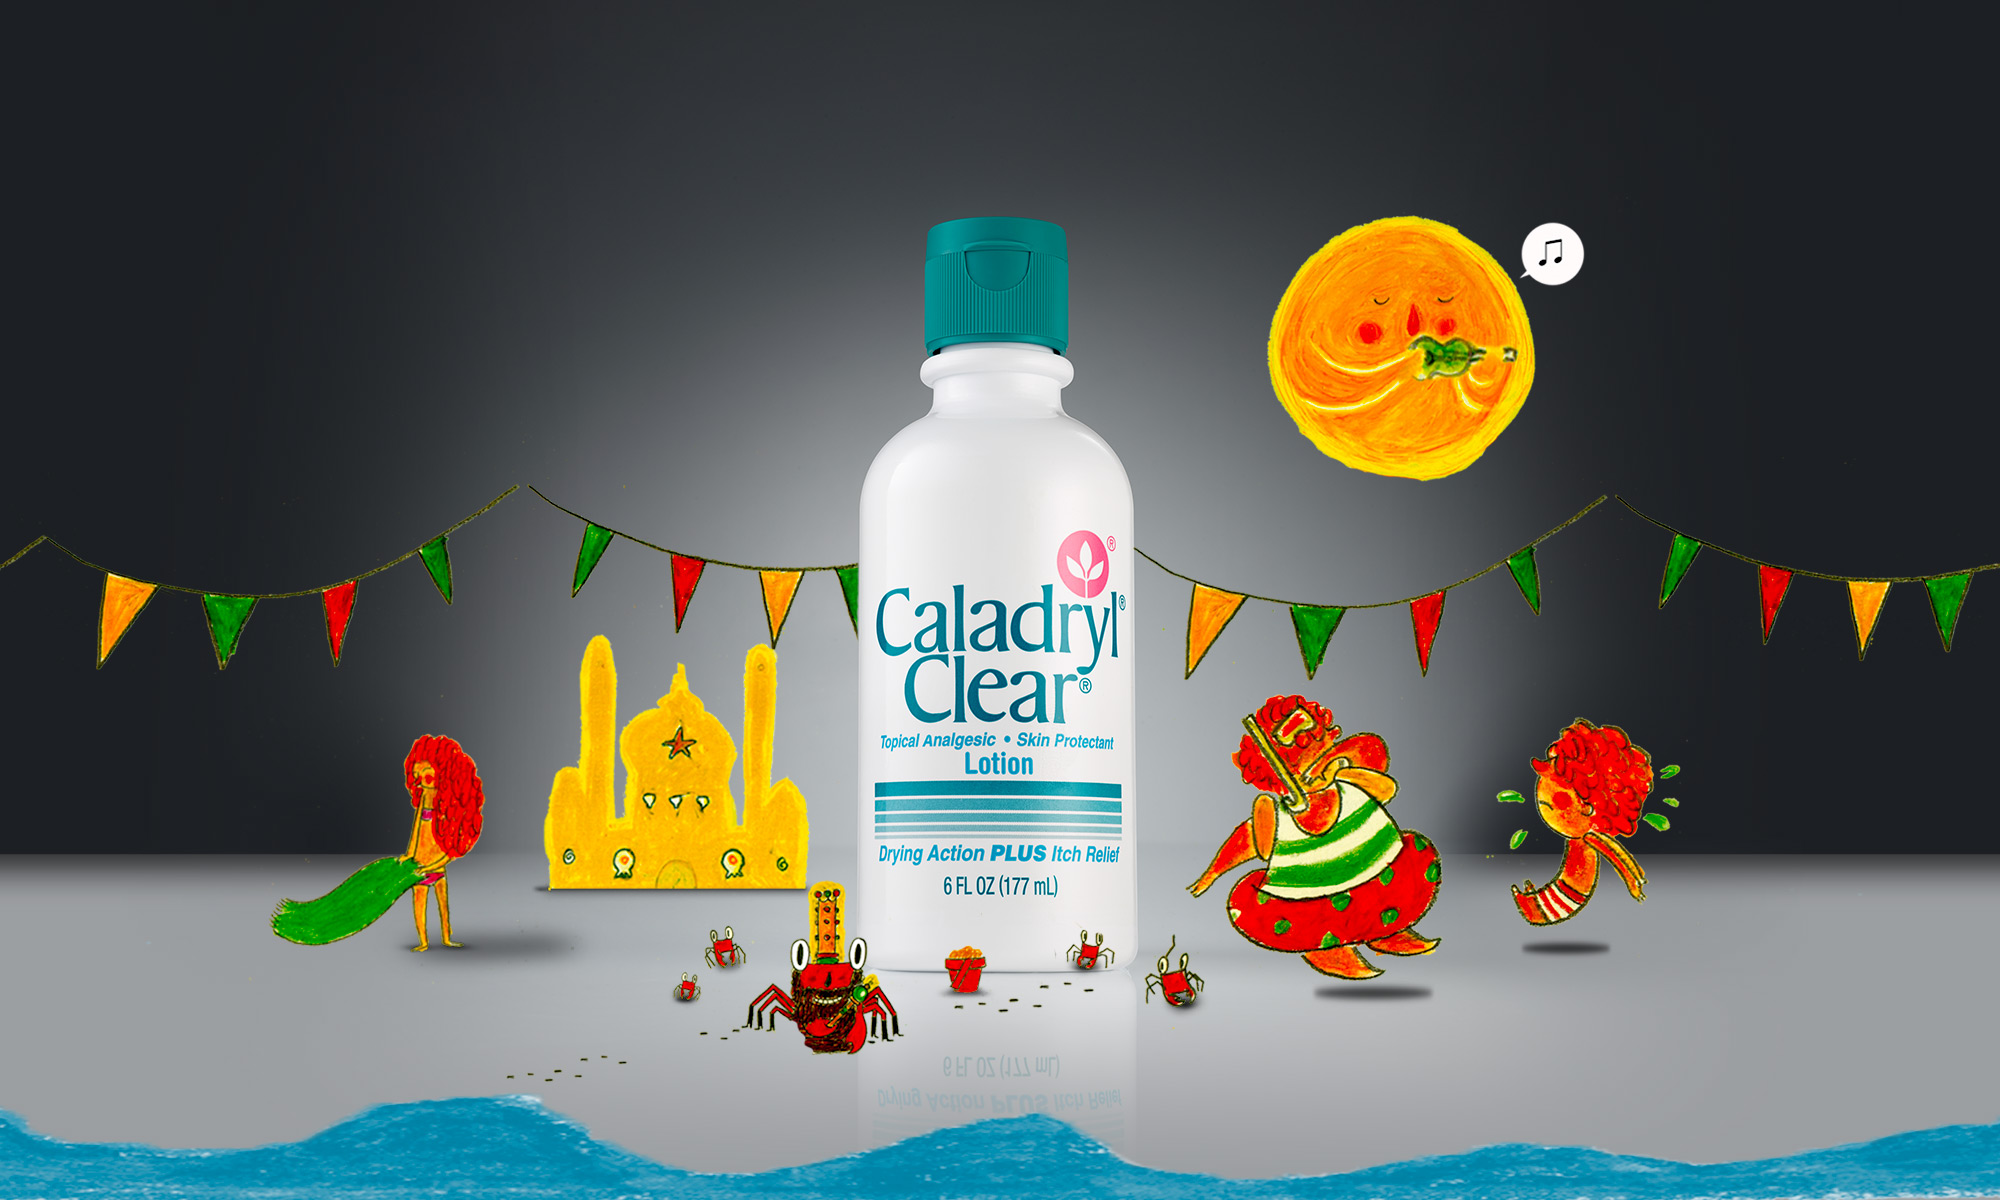 Caladryl Stories TV Spot, Illustrationsand Website